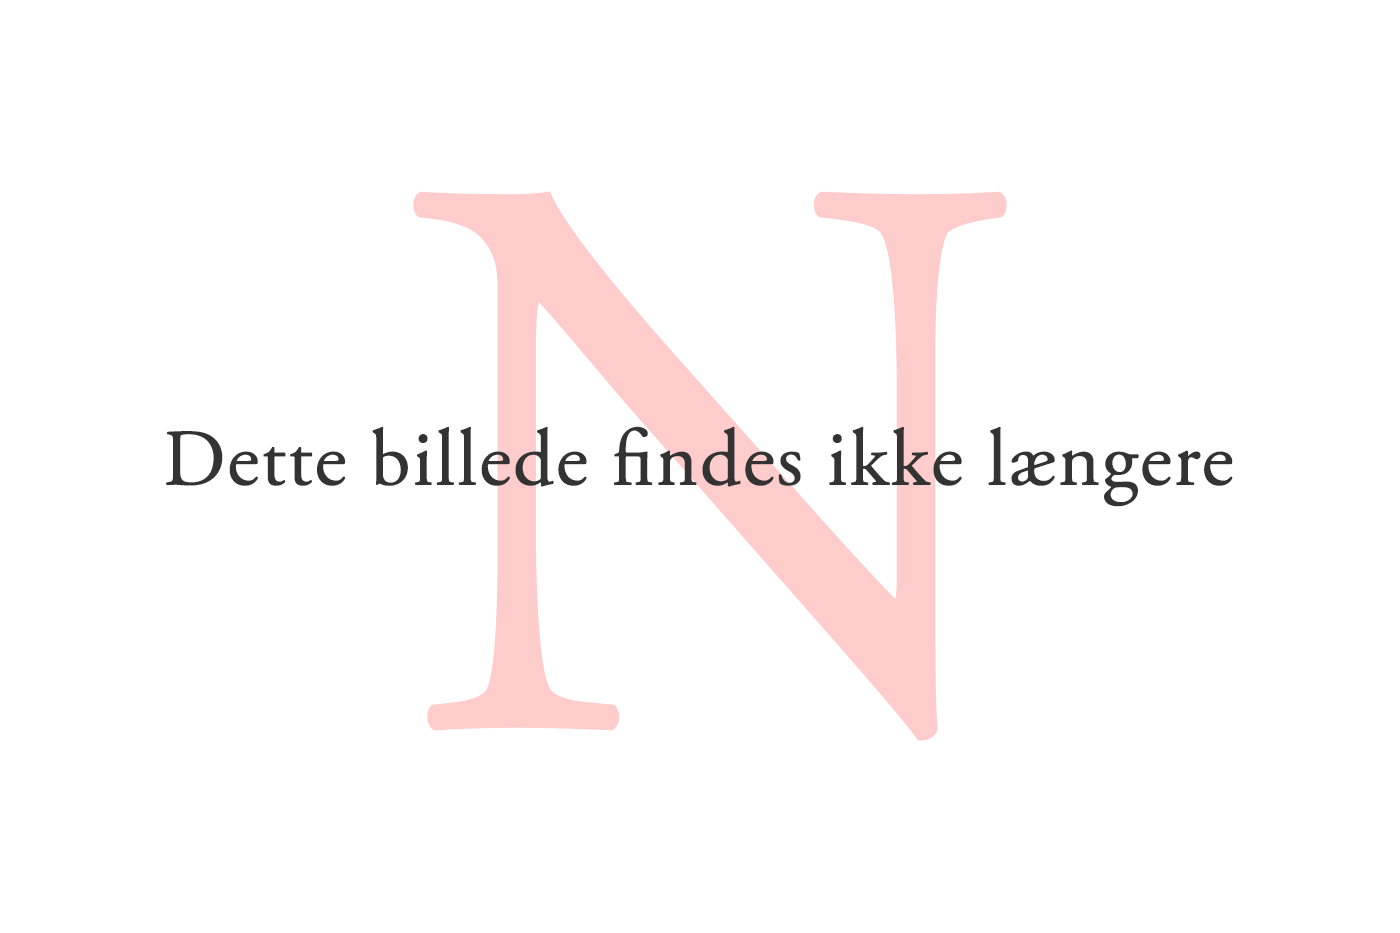 Rune T. Kidde. Copyright: Gorm Vallentin